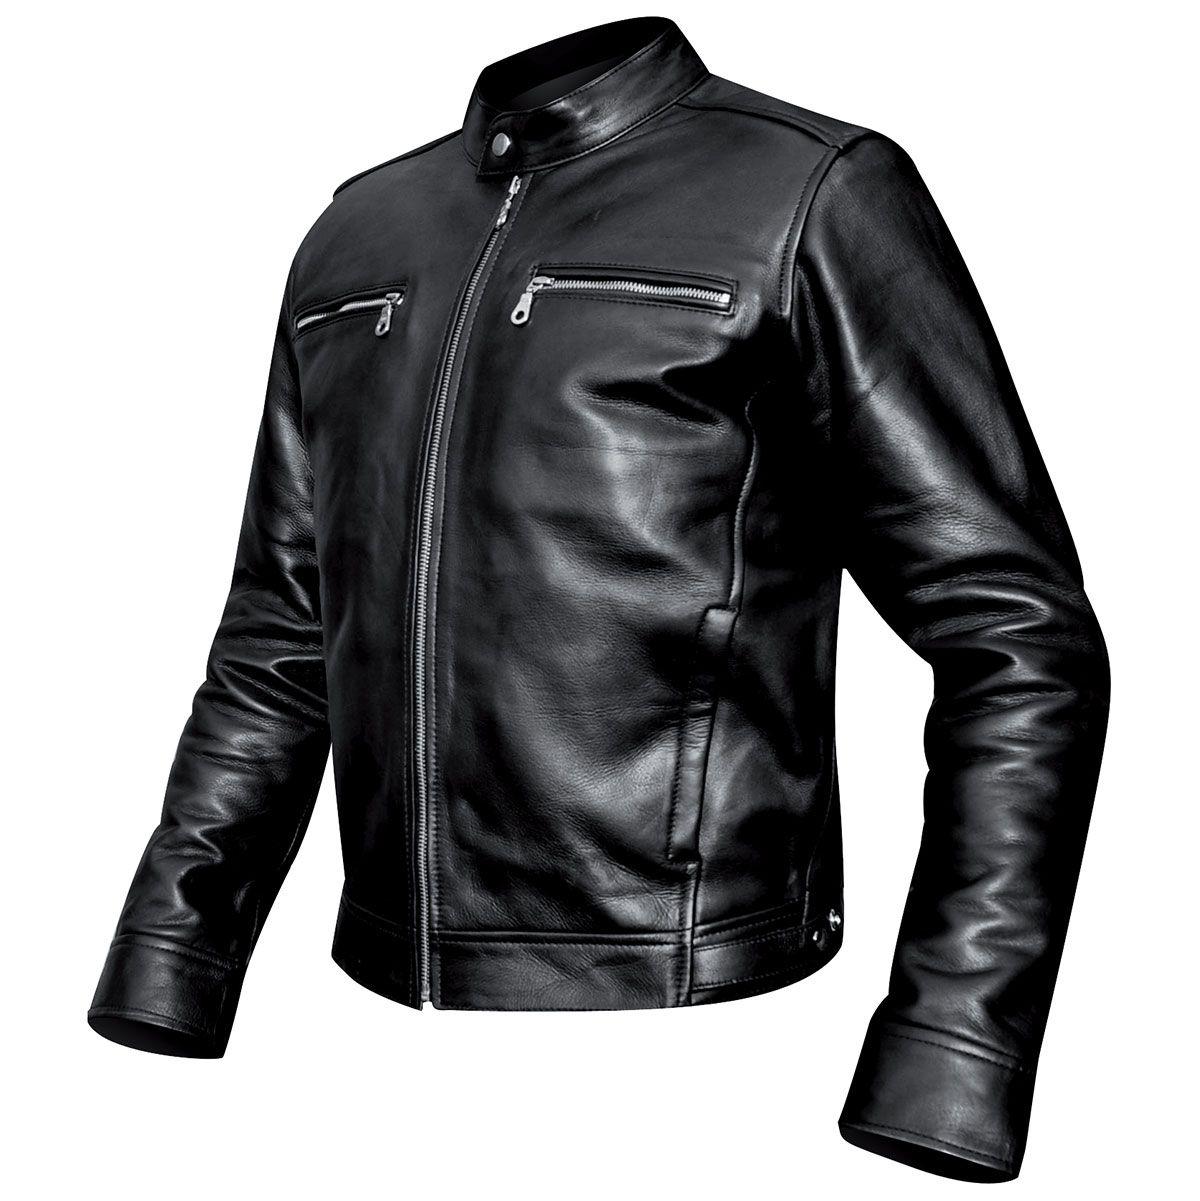 blouson cuir mec osx harrison jacket vestes blousons. Black Bedroom Furniture Sets. Home Design Ideas